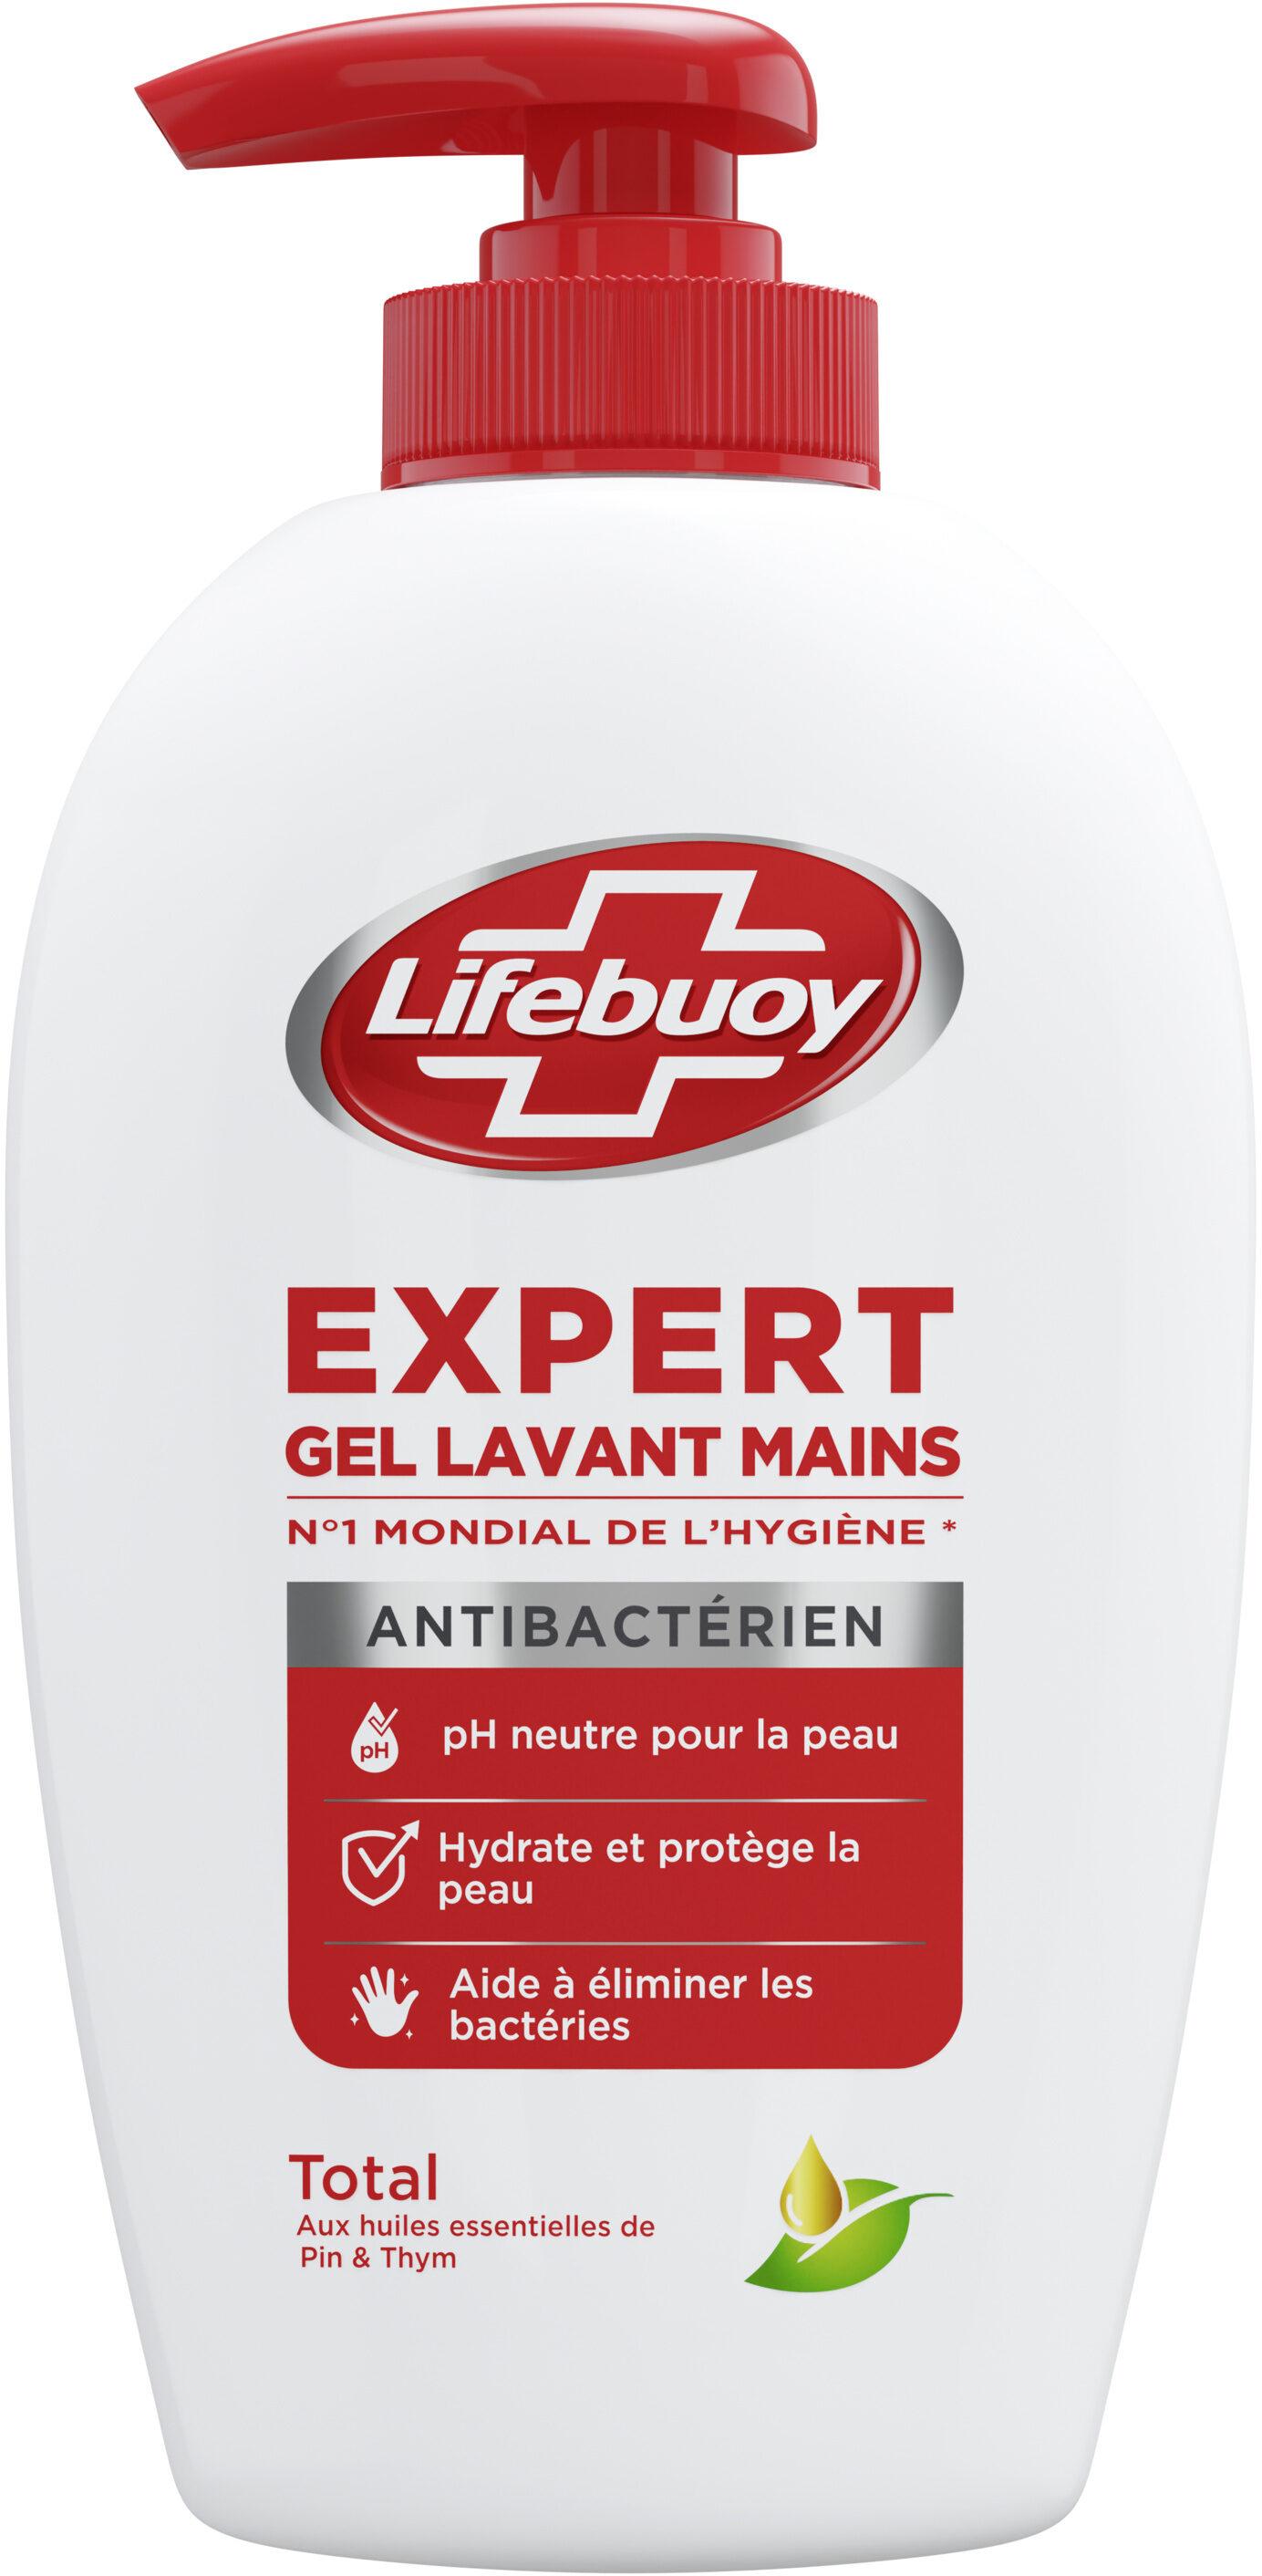 Lifebuoy Expert Gel Lavant Mains Pompe - Product - fr